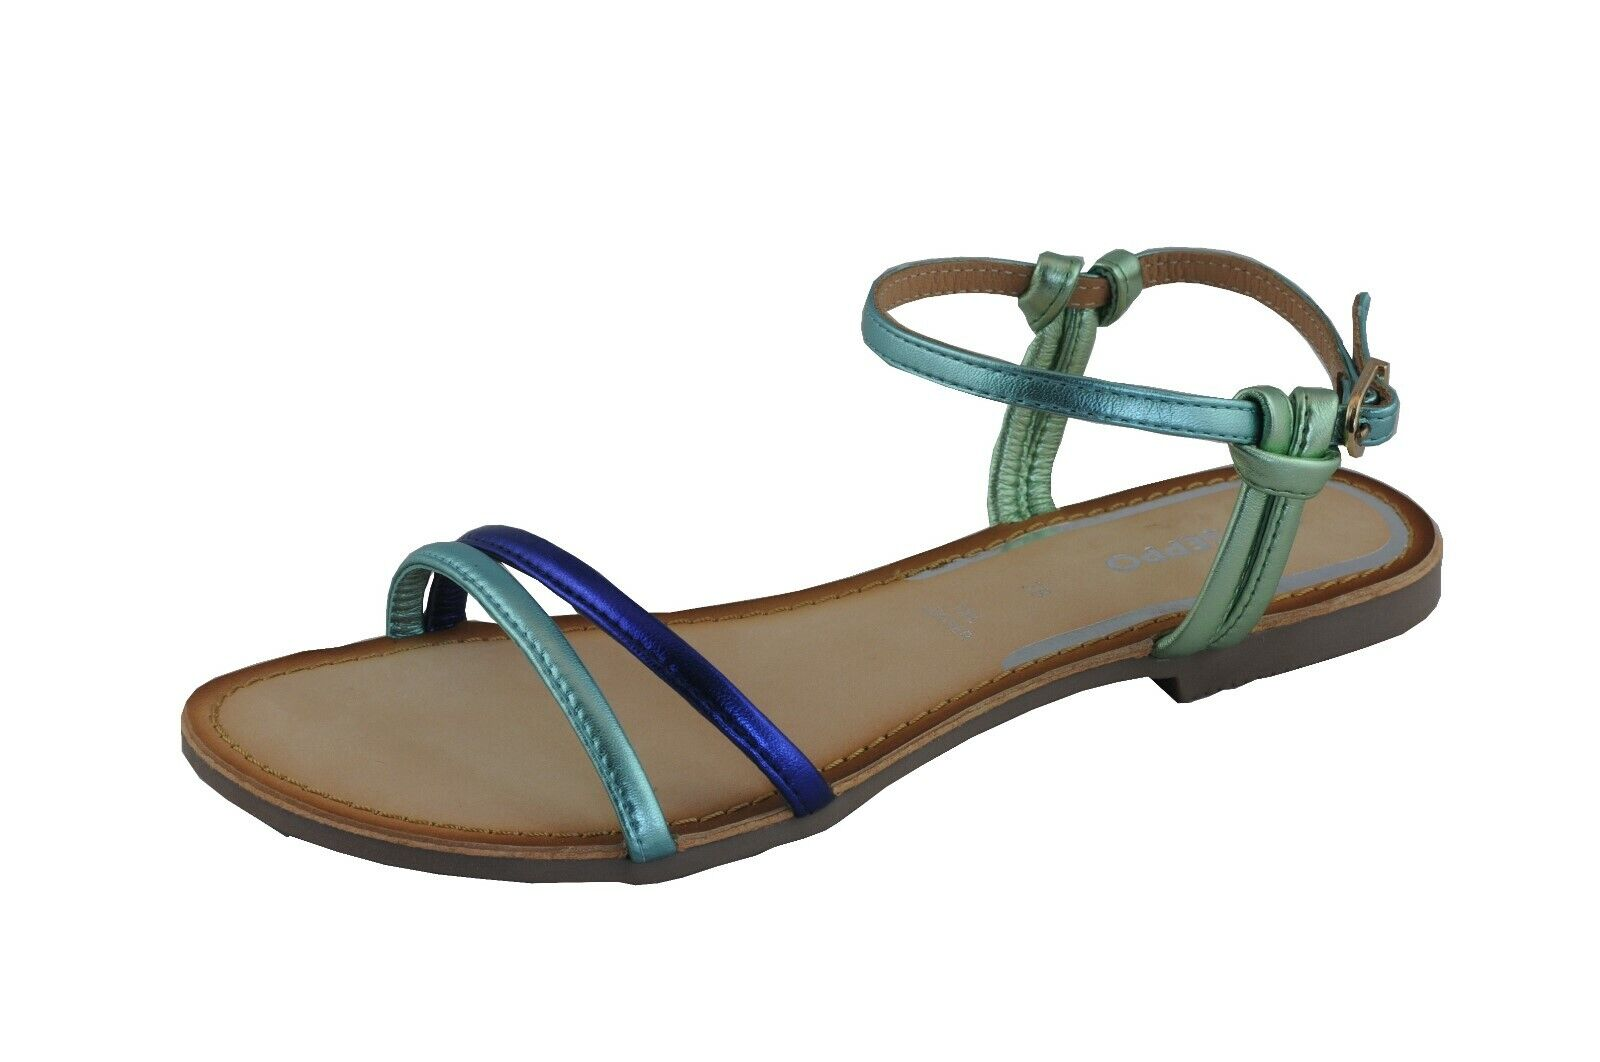 Gioseppo Sandale Femmes Rieti 48217 Vert-Bleu en Cuir D'Agneau Doubleure en Cuir